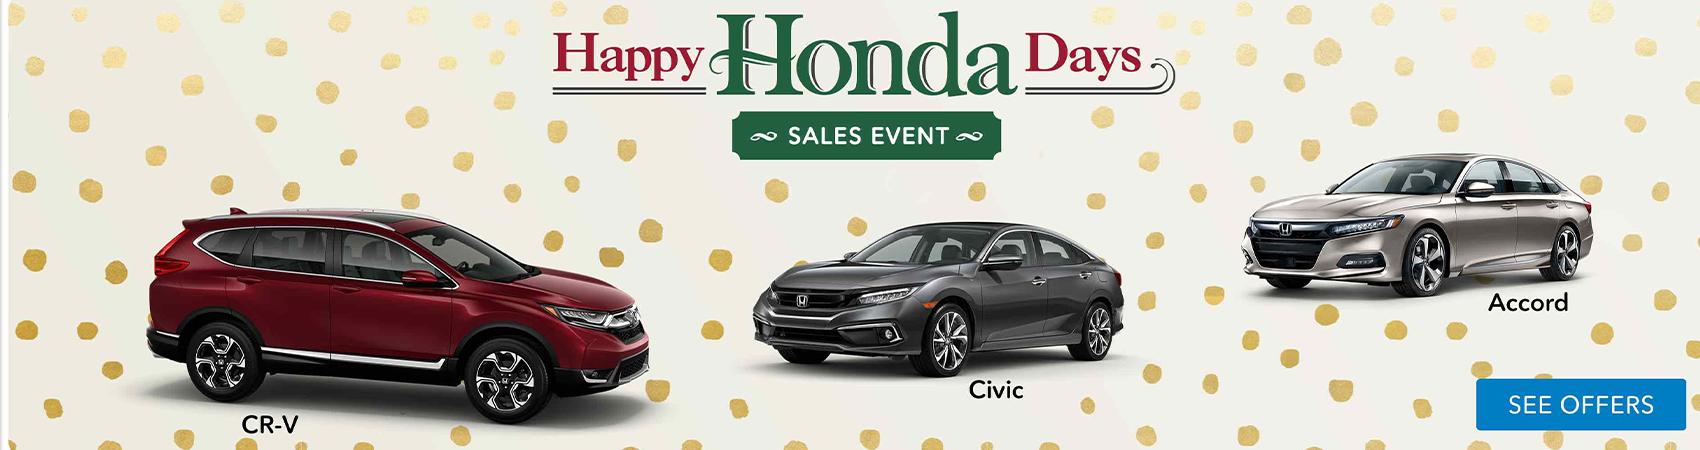 Happy Honda Days National Sales Event